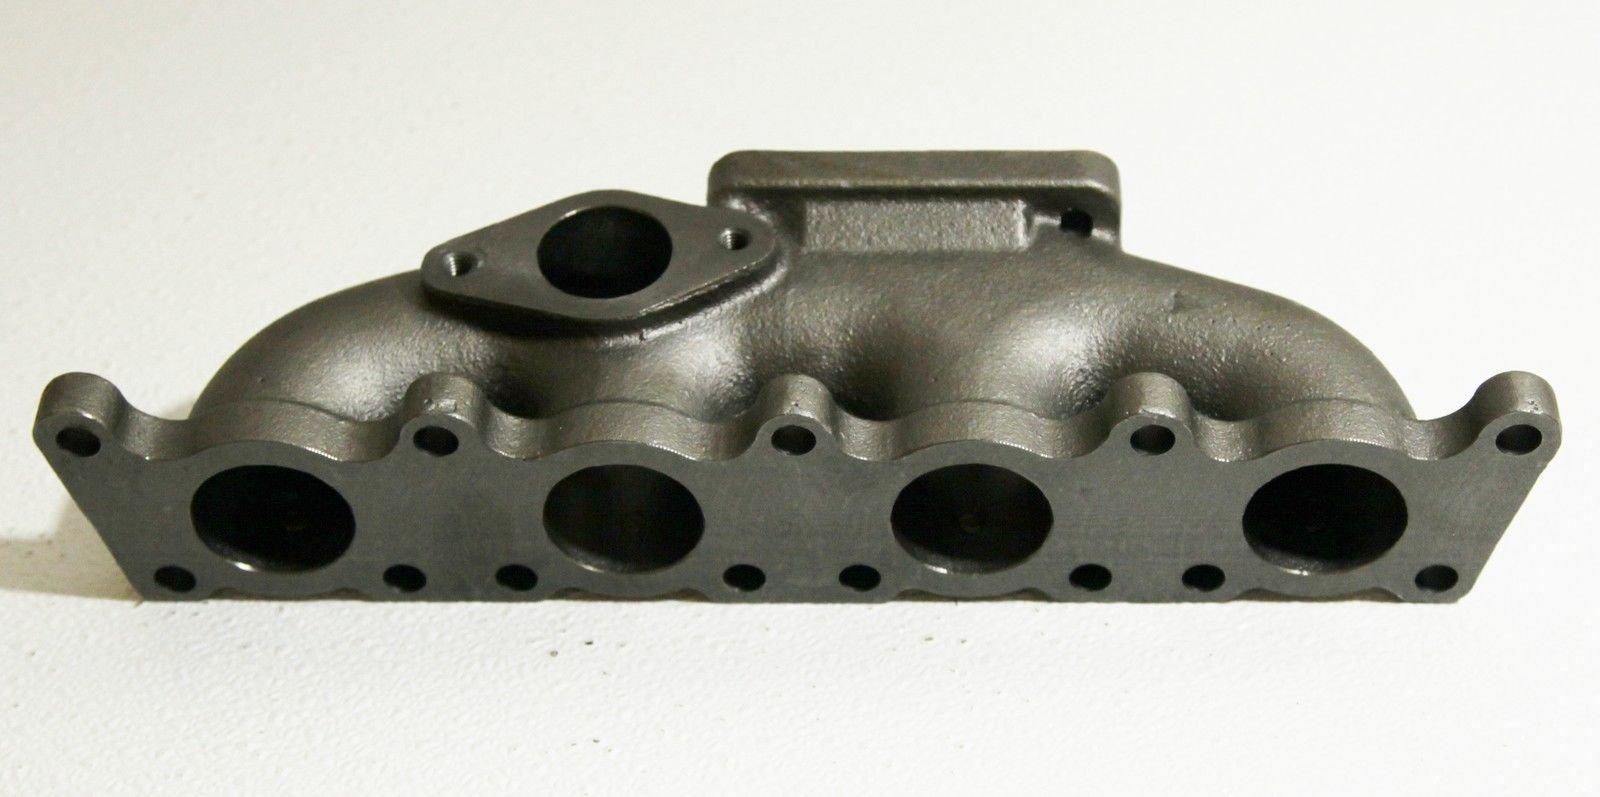 VW 1.8T tra Golf Jetta MK4 99-05 Cast Iron Turbo Manifold T3 by emusa (Image #2)